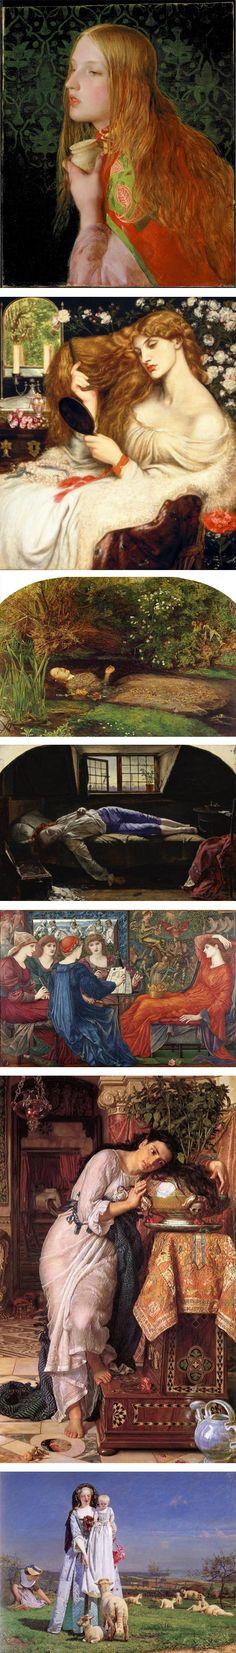 Pre-Raphaelites: Victorian Avant Garde: Frederick Sandys, Dante Gabriel Rosetti, Sir John Everett Millais, Henry Wallis, William Holman-Hunt, Ford Maddox Brown